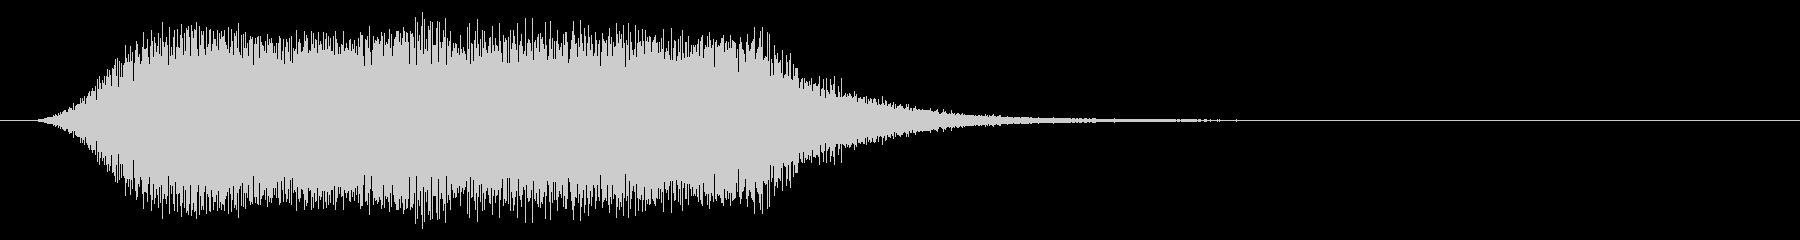 SF系の効果音(レーザー/移動/ゲート)の未再生の波形